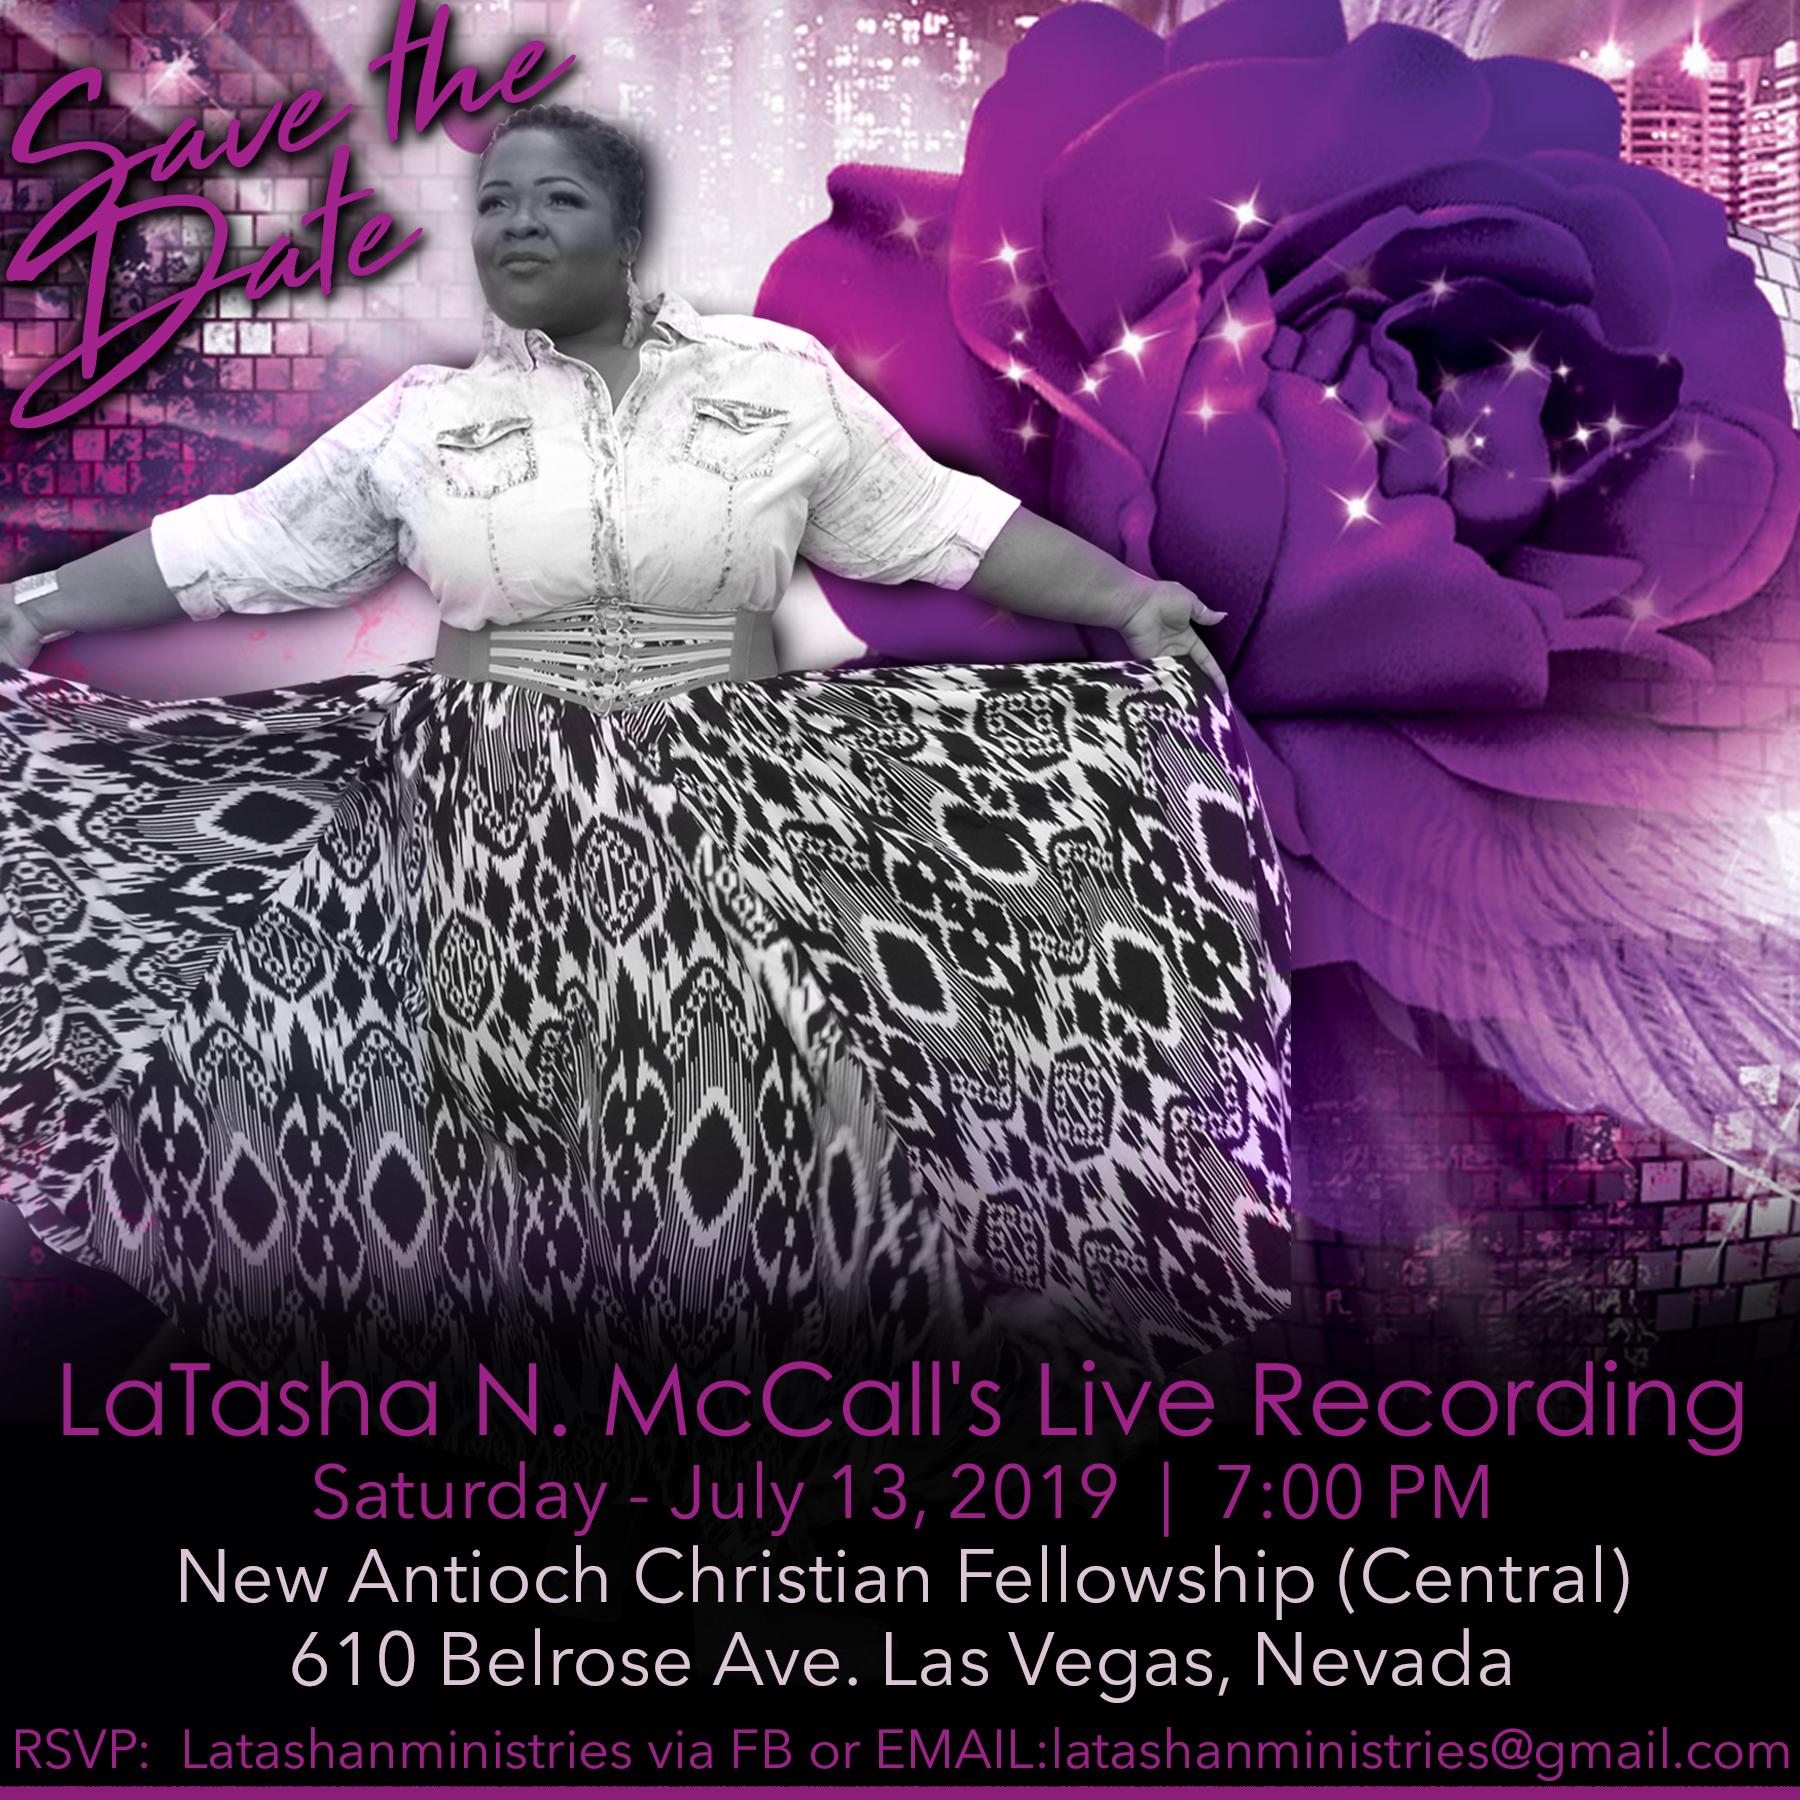 Latasha McCalls Live Recording